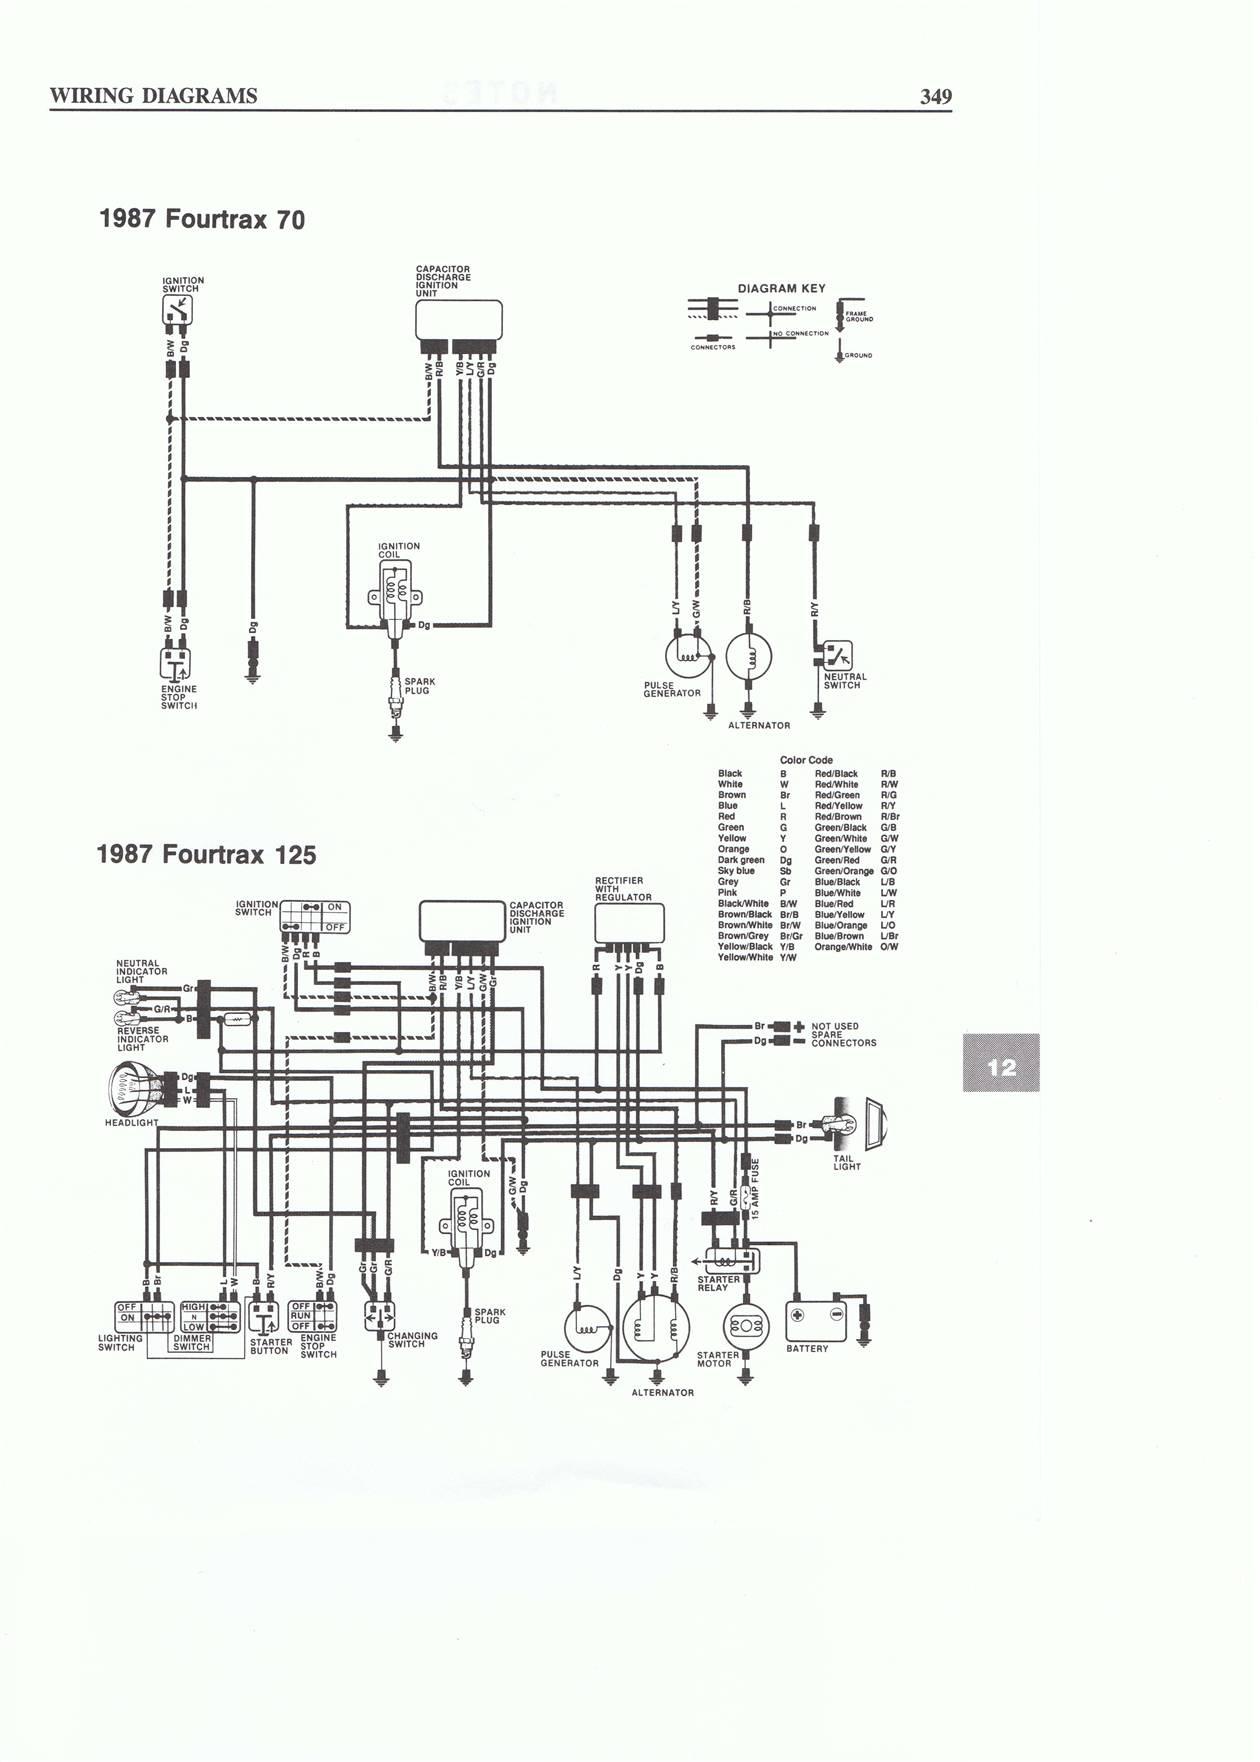 Eton Viper 90 2 Stroke Wiring Diagram Auto Electrical E Ton 90cc Gmc Fuse Box Diagrams